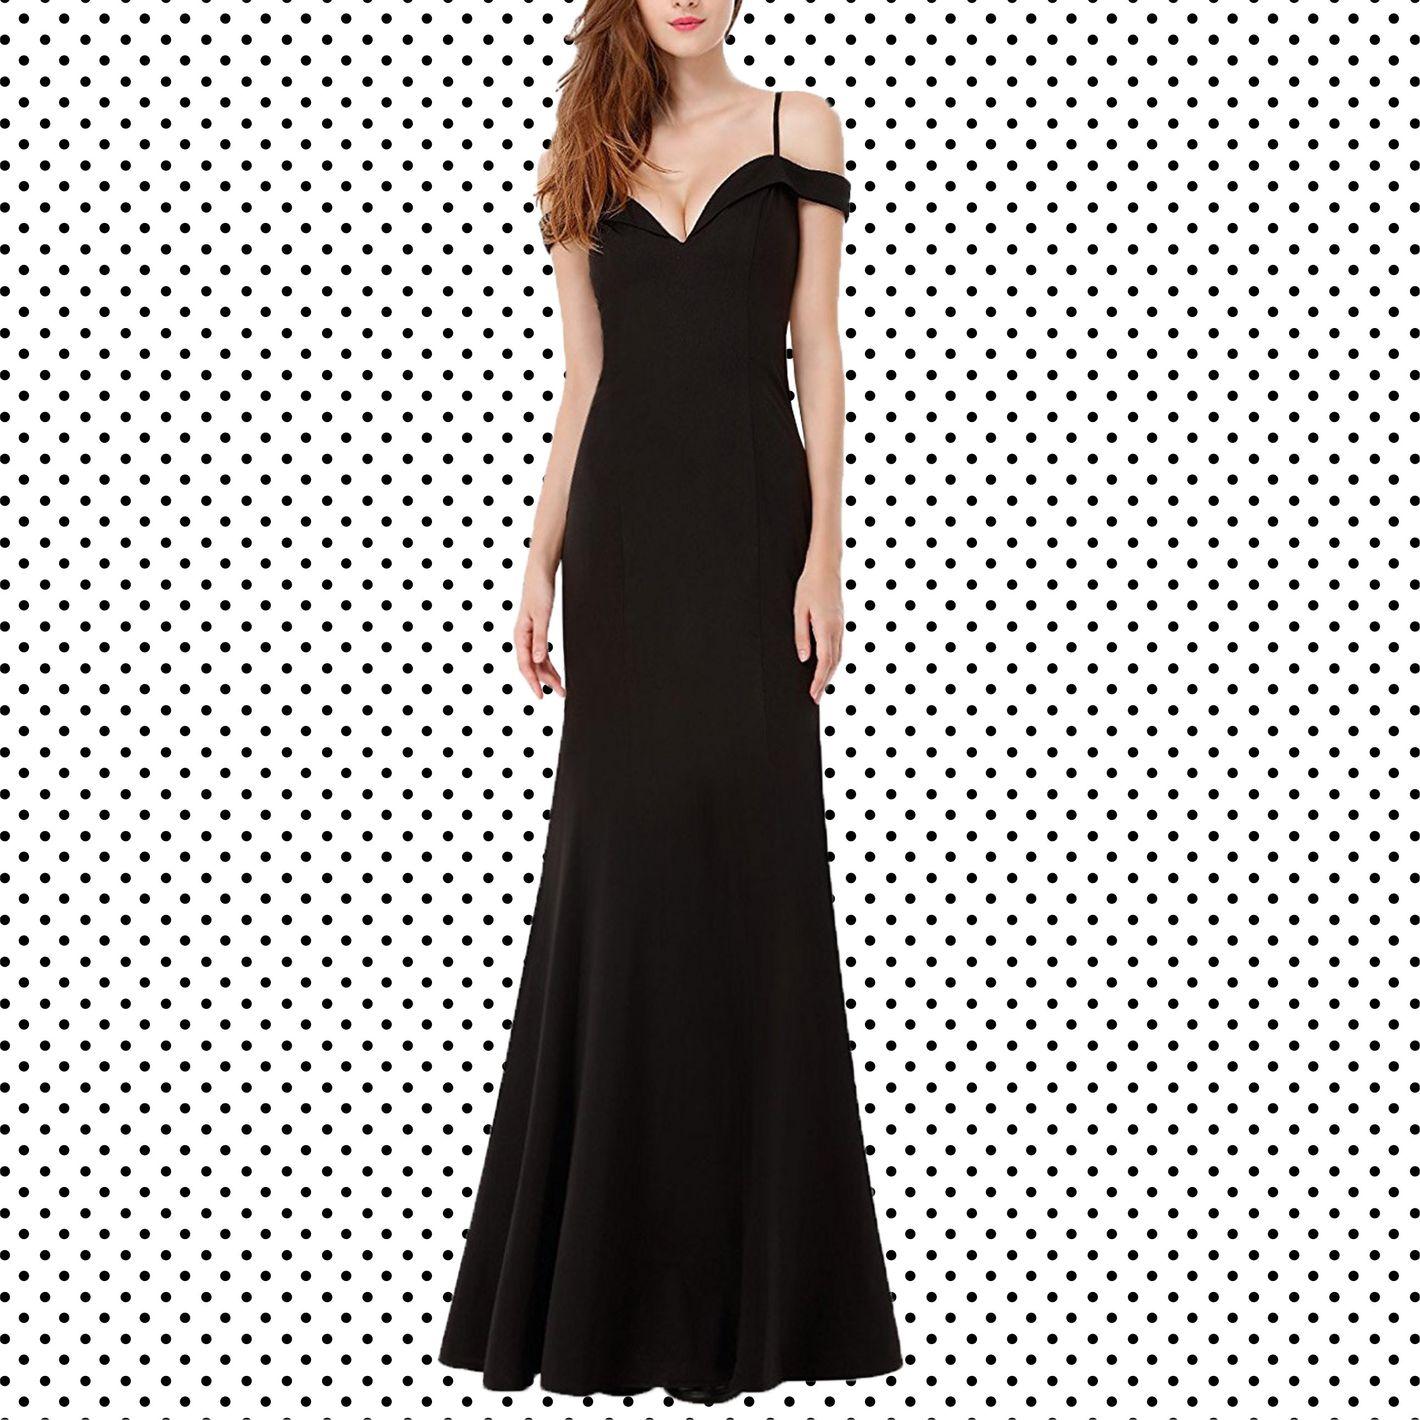 Großartig Dresses For Older Women To Wear To A Wedding Bilder ...